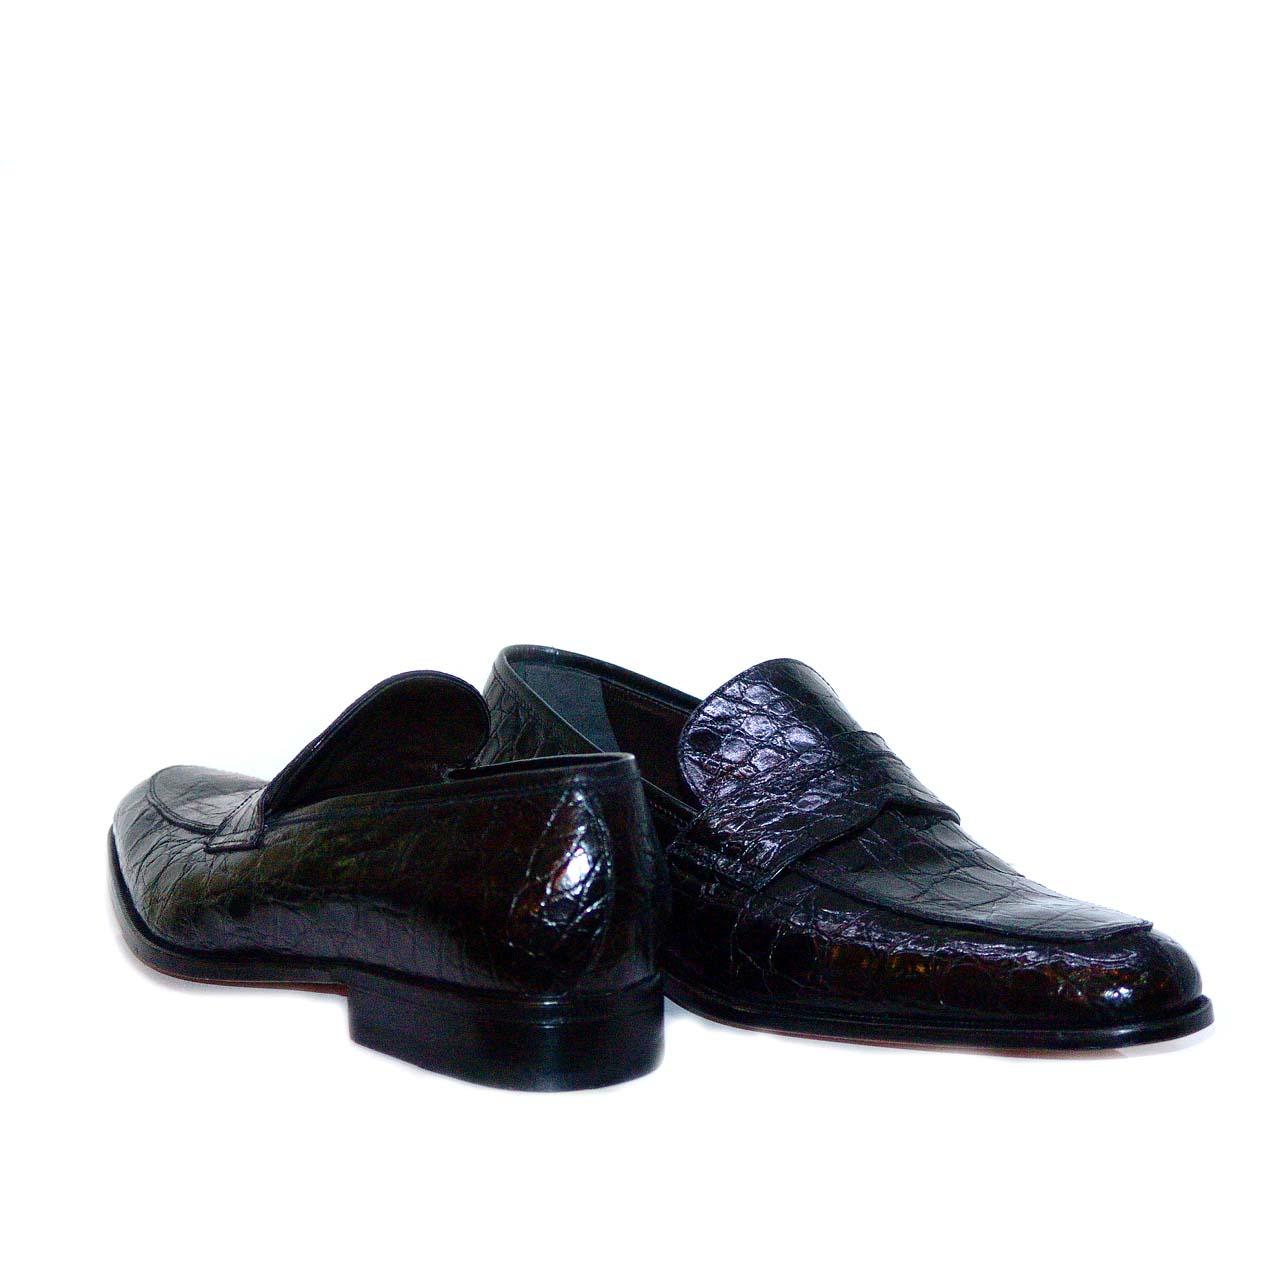 Moreschi 36630 Full Alligator Penny Loafer Black